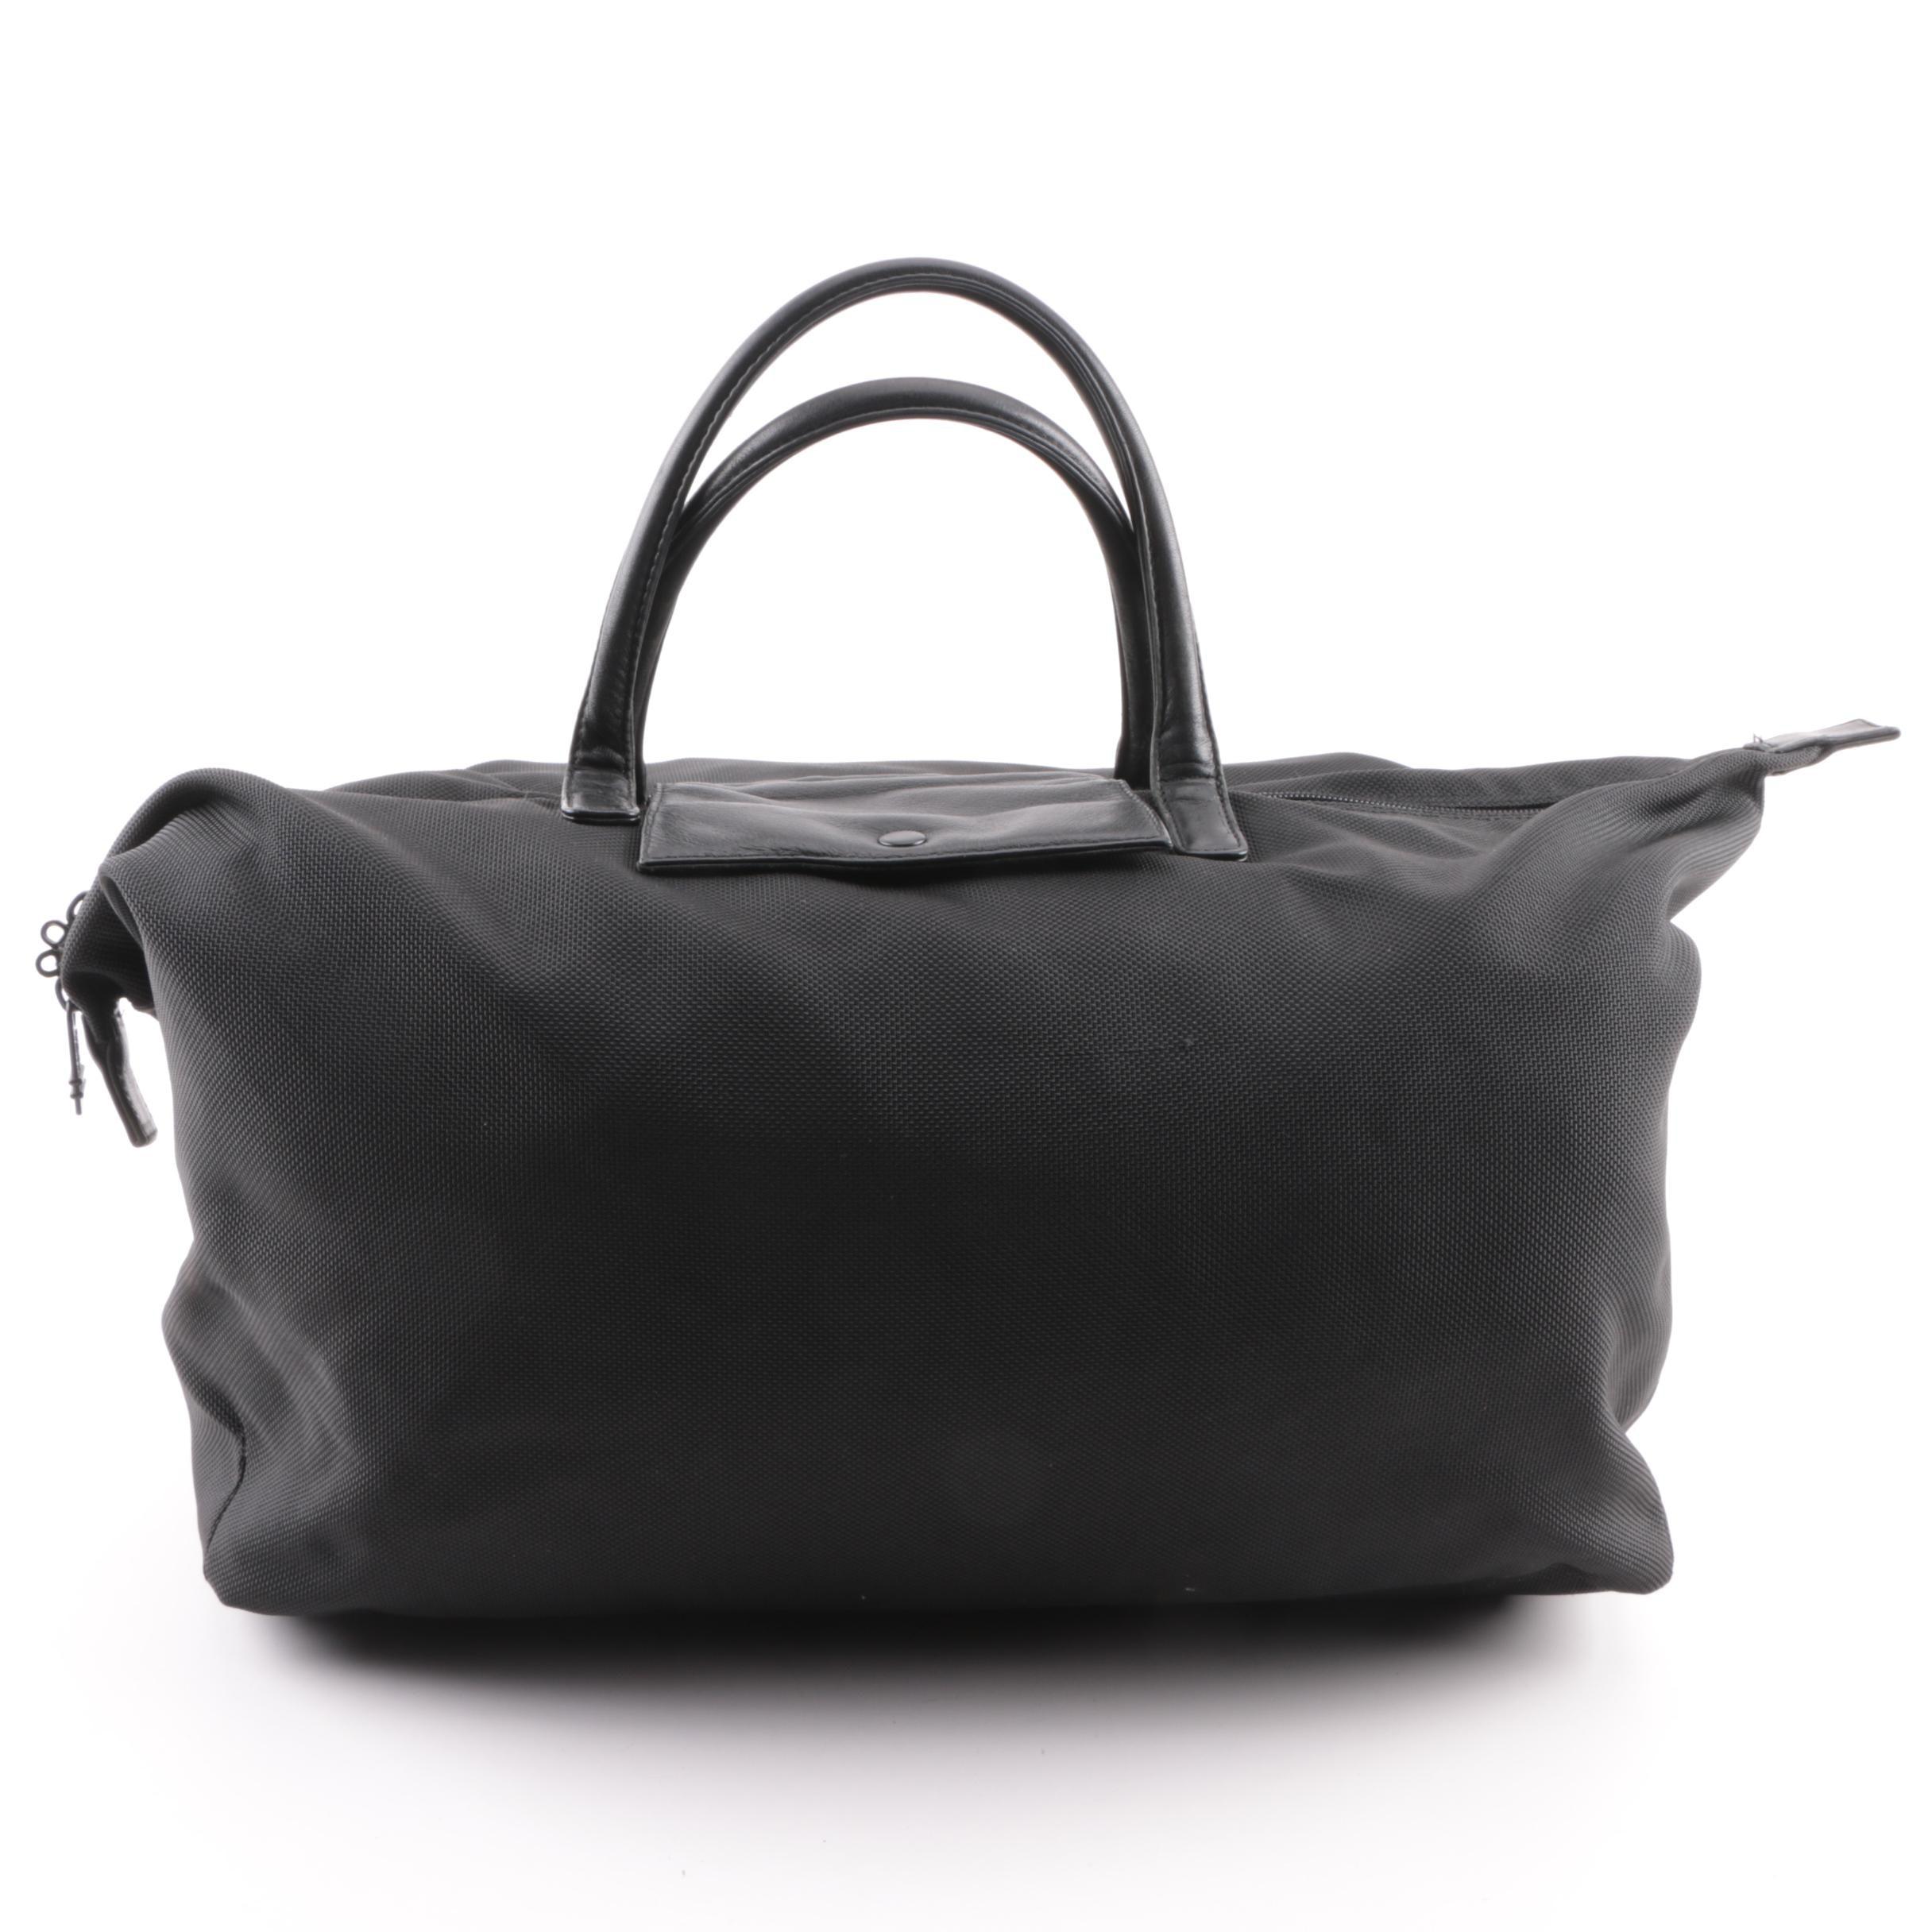 Tumi Black Nylon and Leather Tote